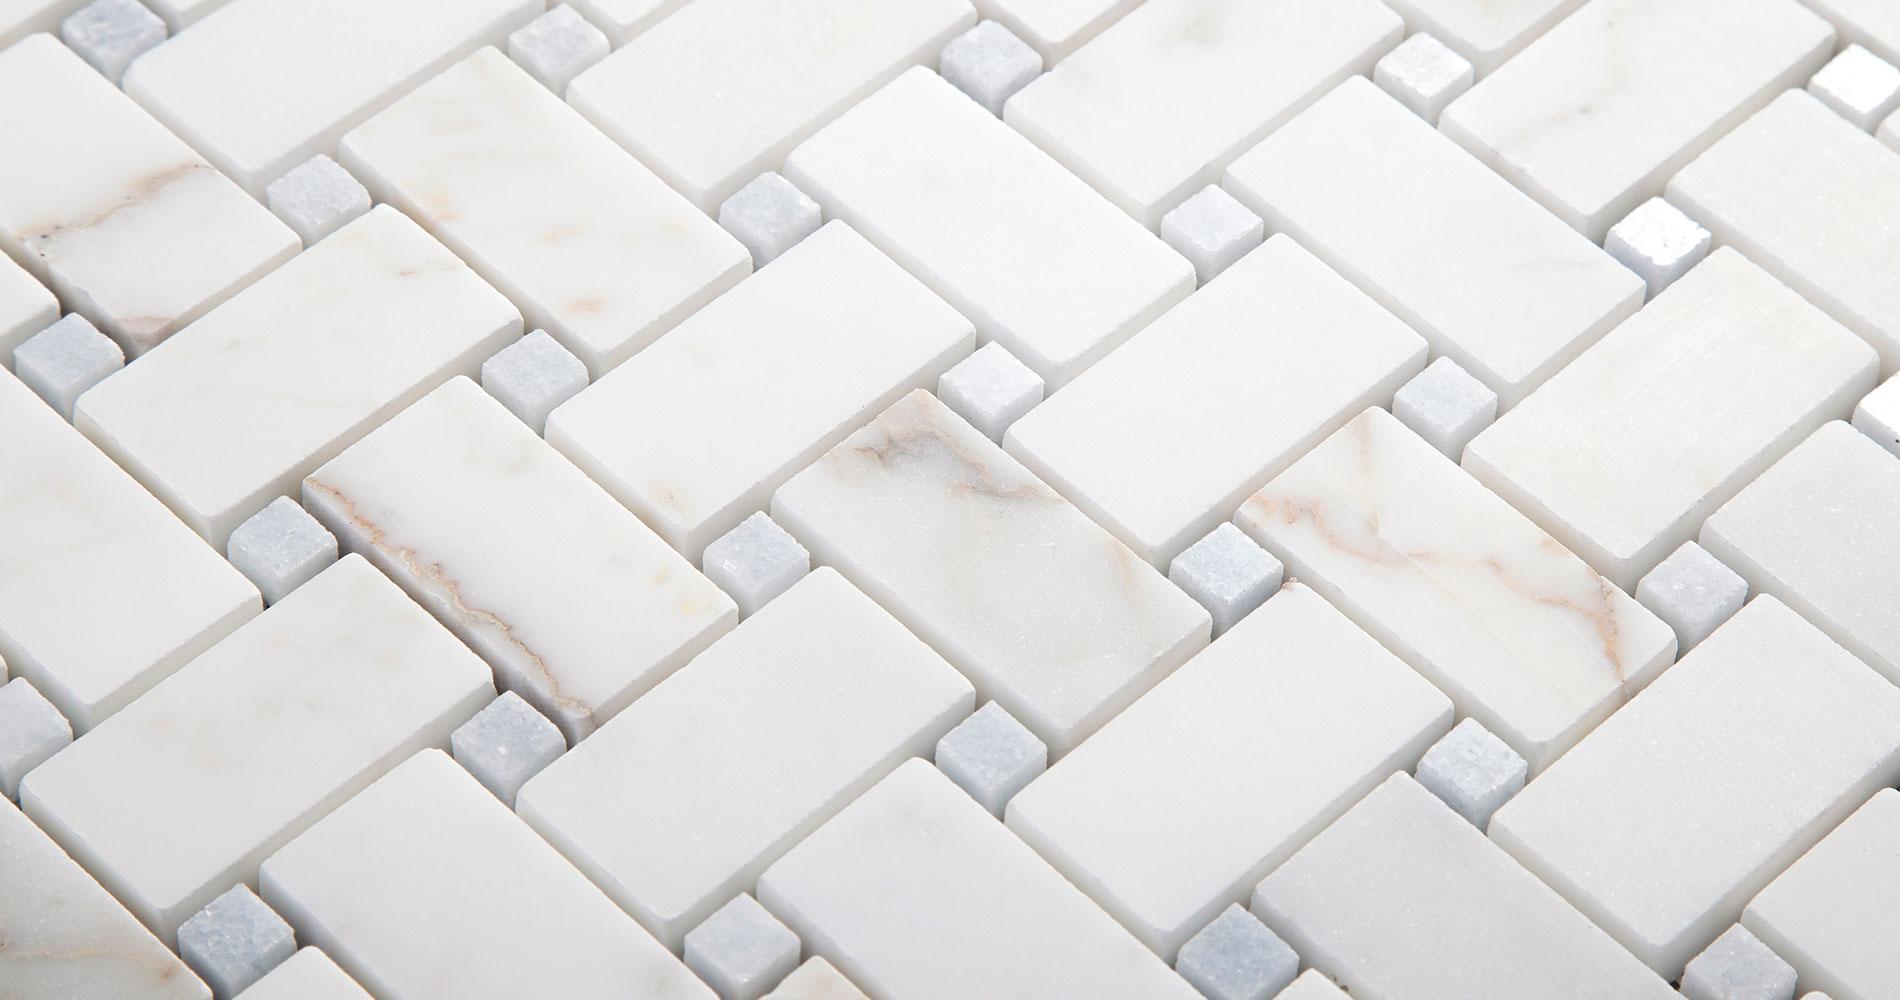 centurymosaic-Calacatta-Gold-Marble-Basketweave-Mosaic-Tile-Collection-4